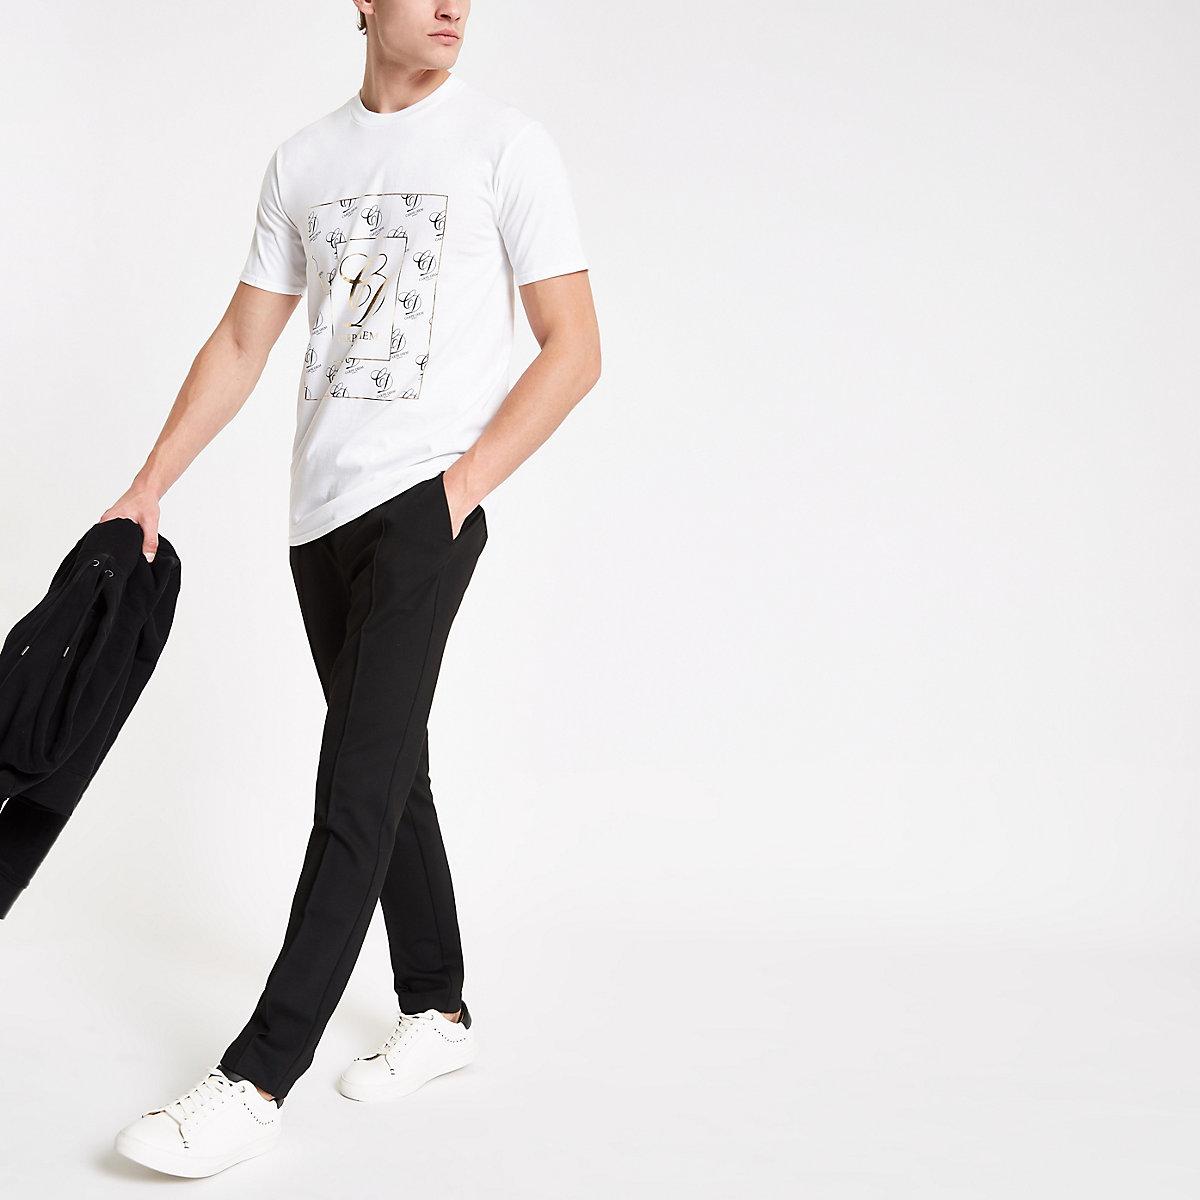 White gold foil 'Carpe diem' T-shirt